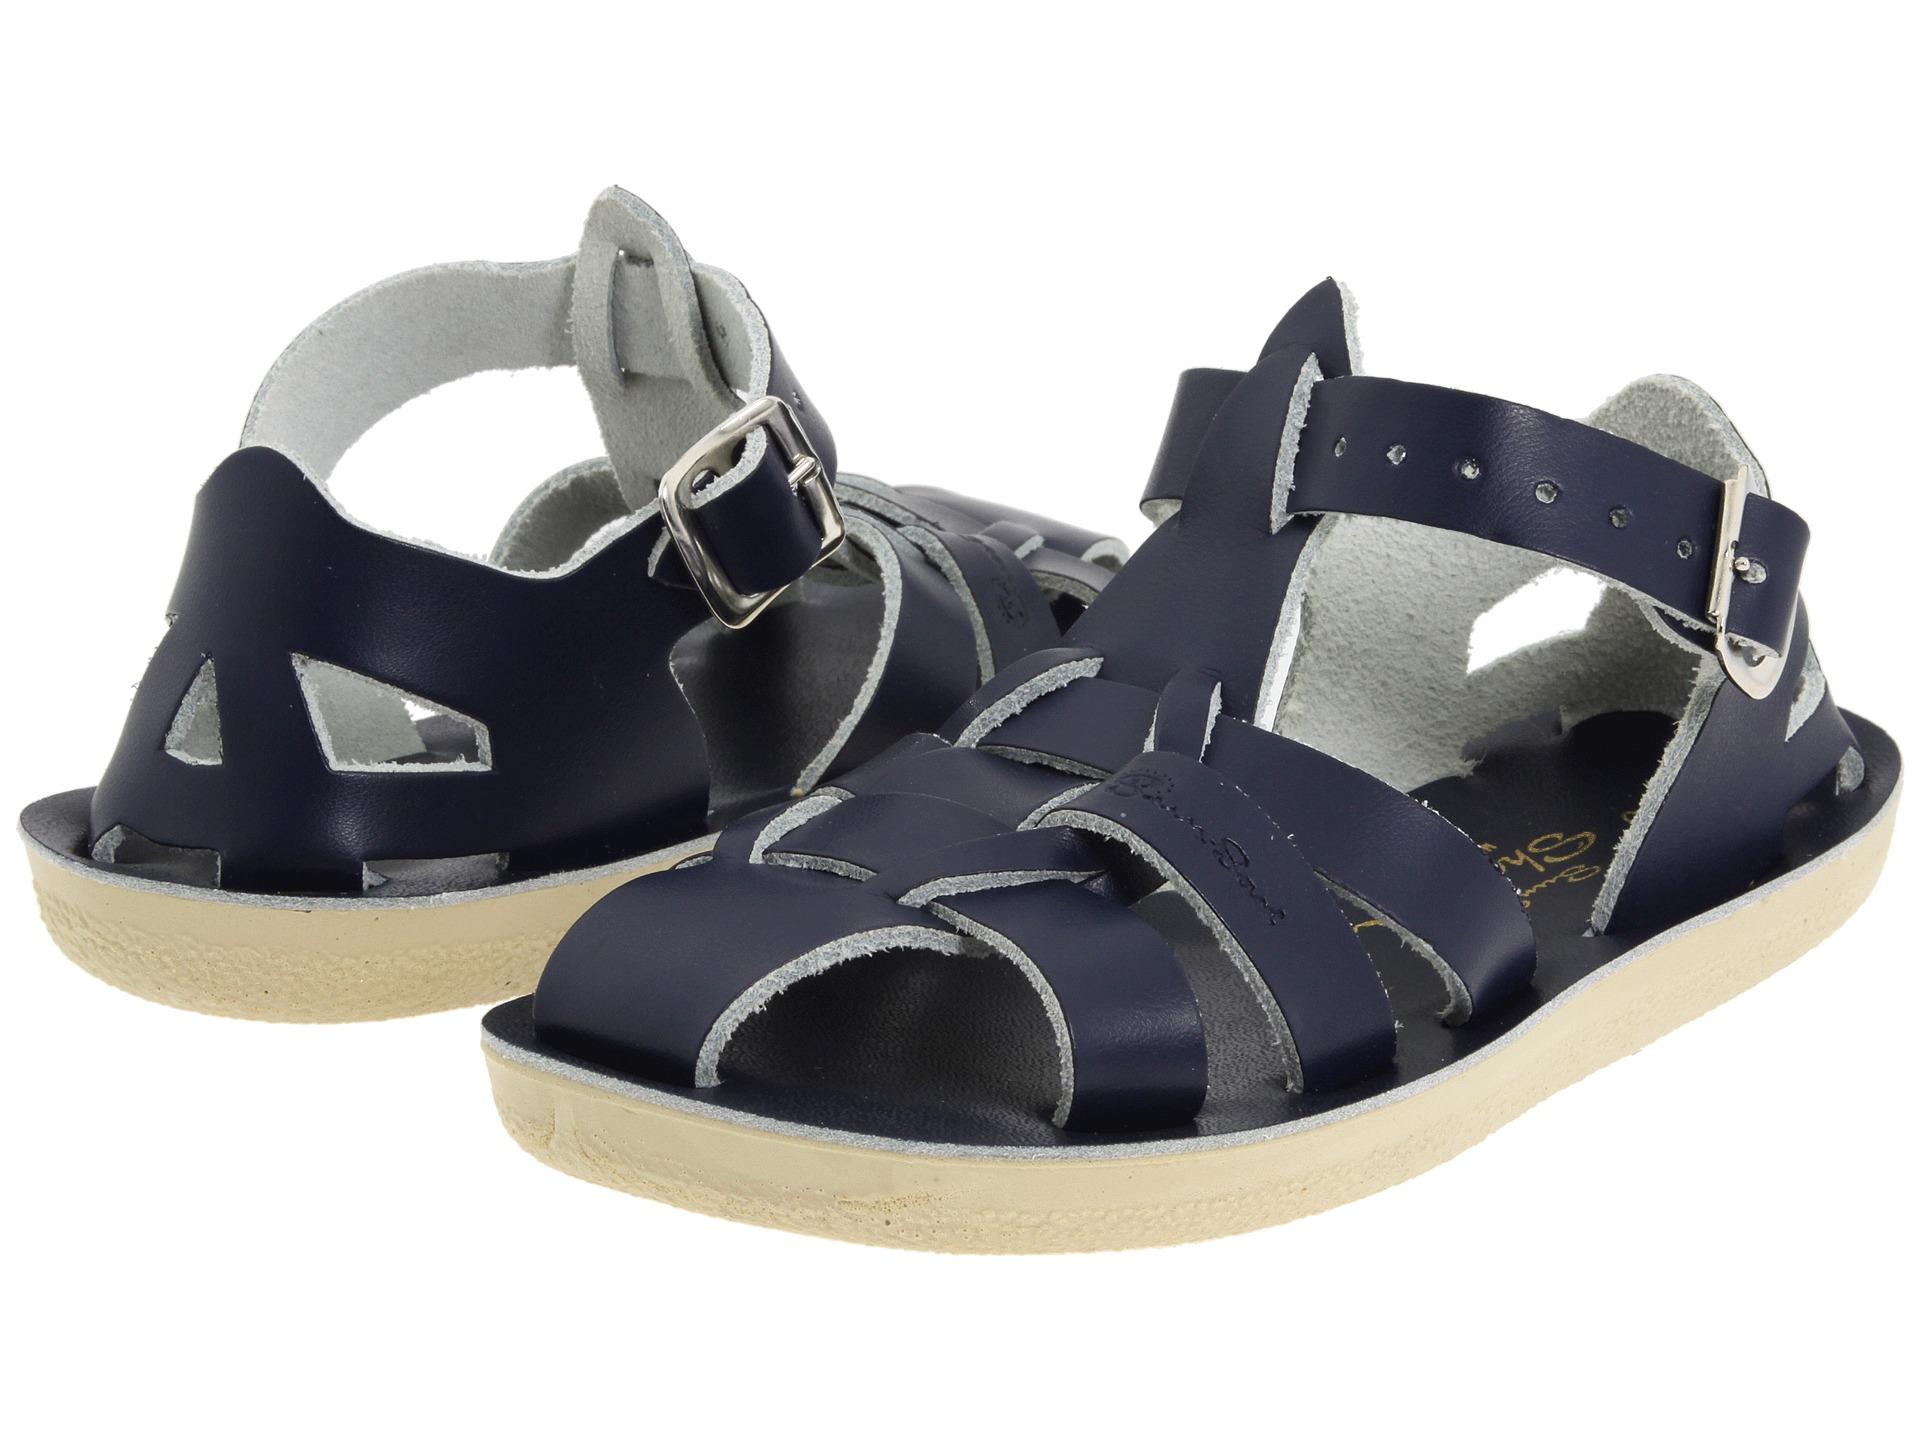 salt water sandal by hoy shoes sun san sharks toddler little kid free shipping. Black Bedroom Furniture Sets. Home Design Ideas